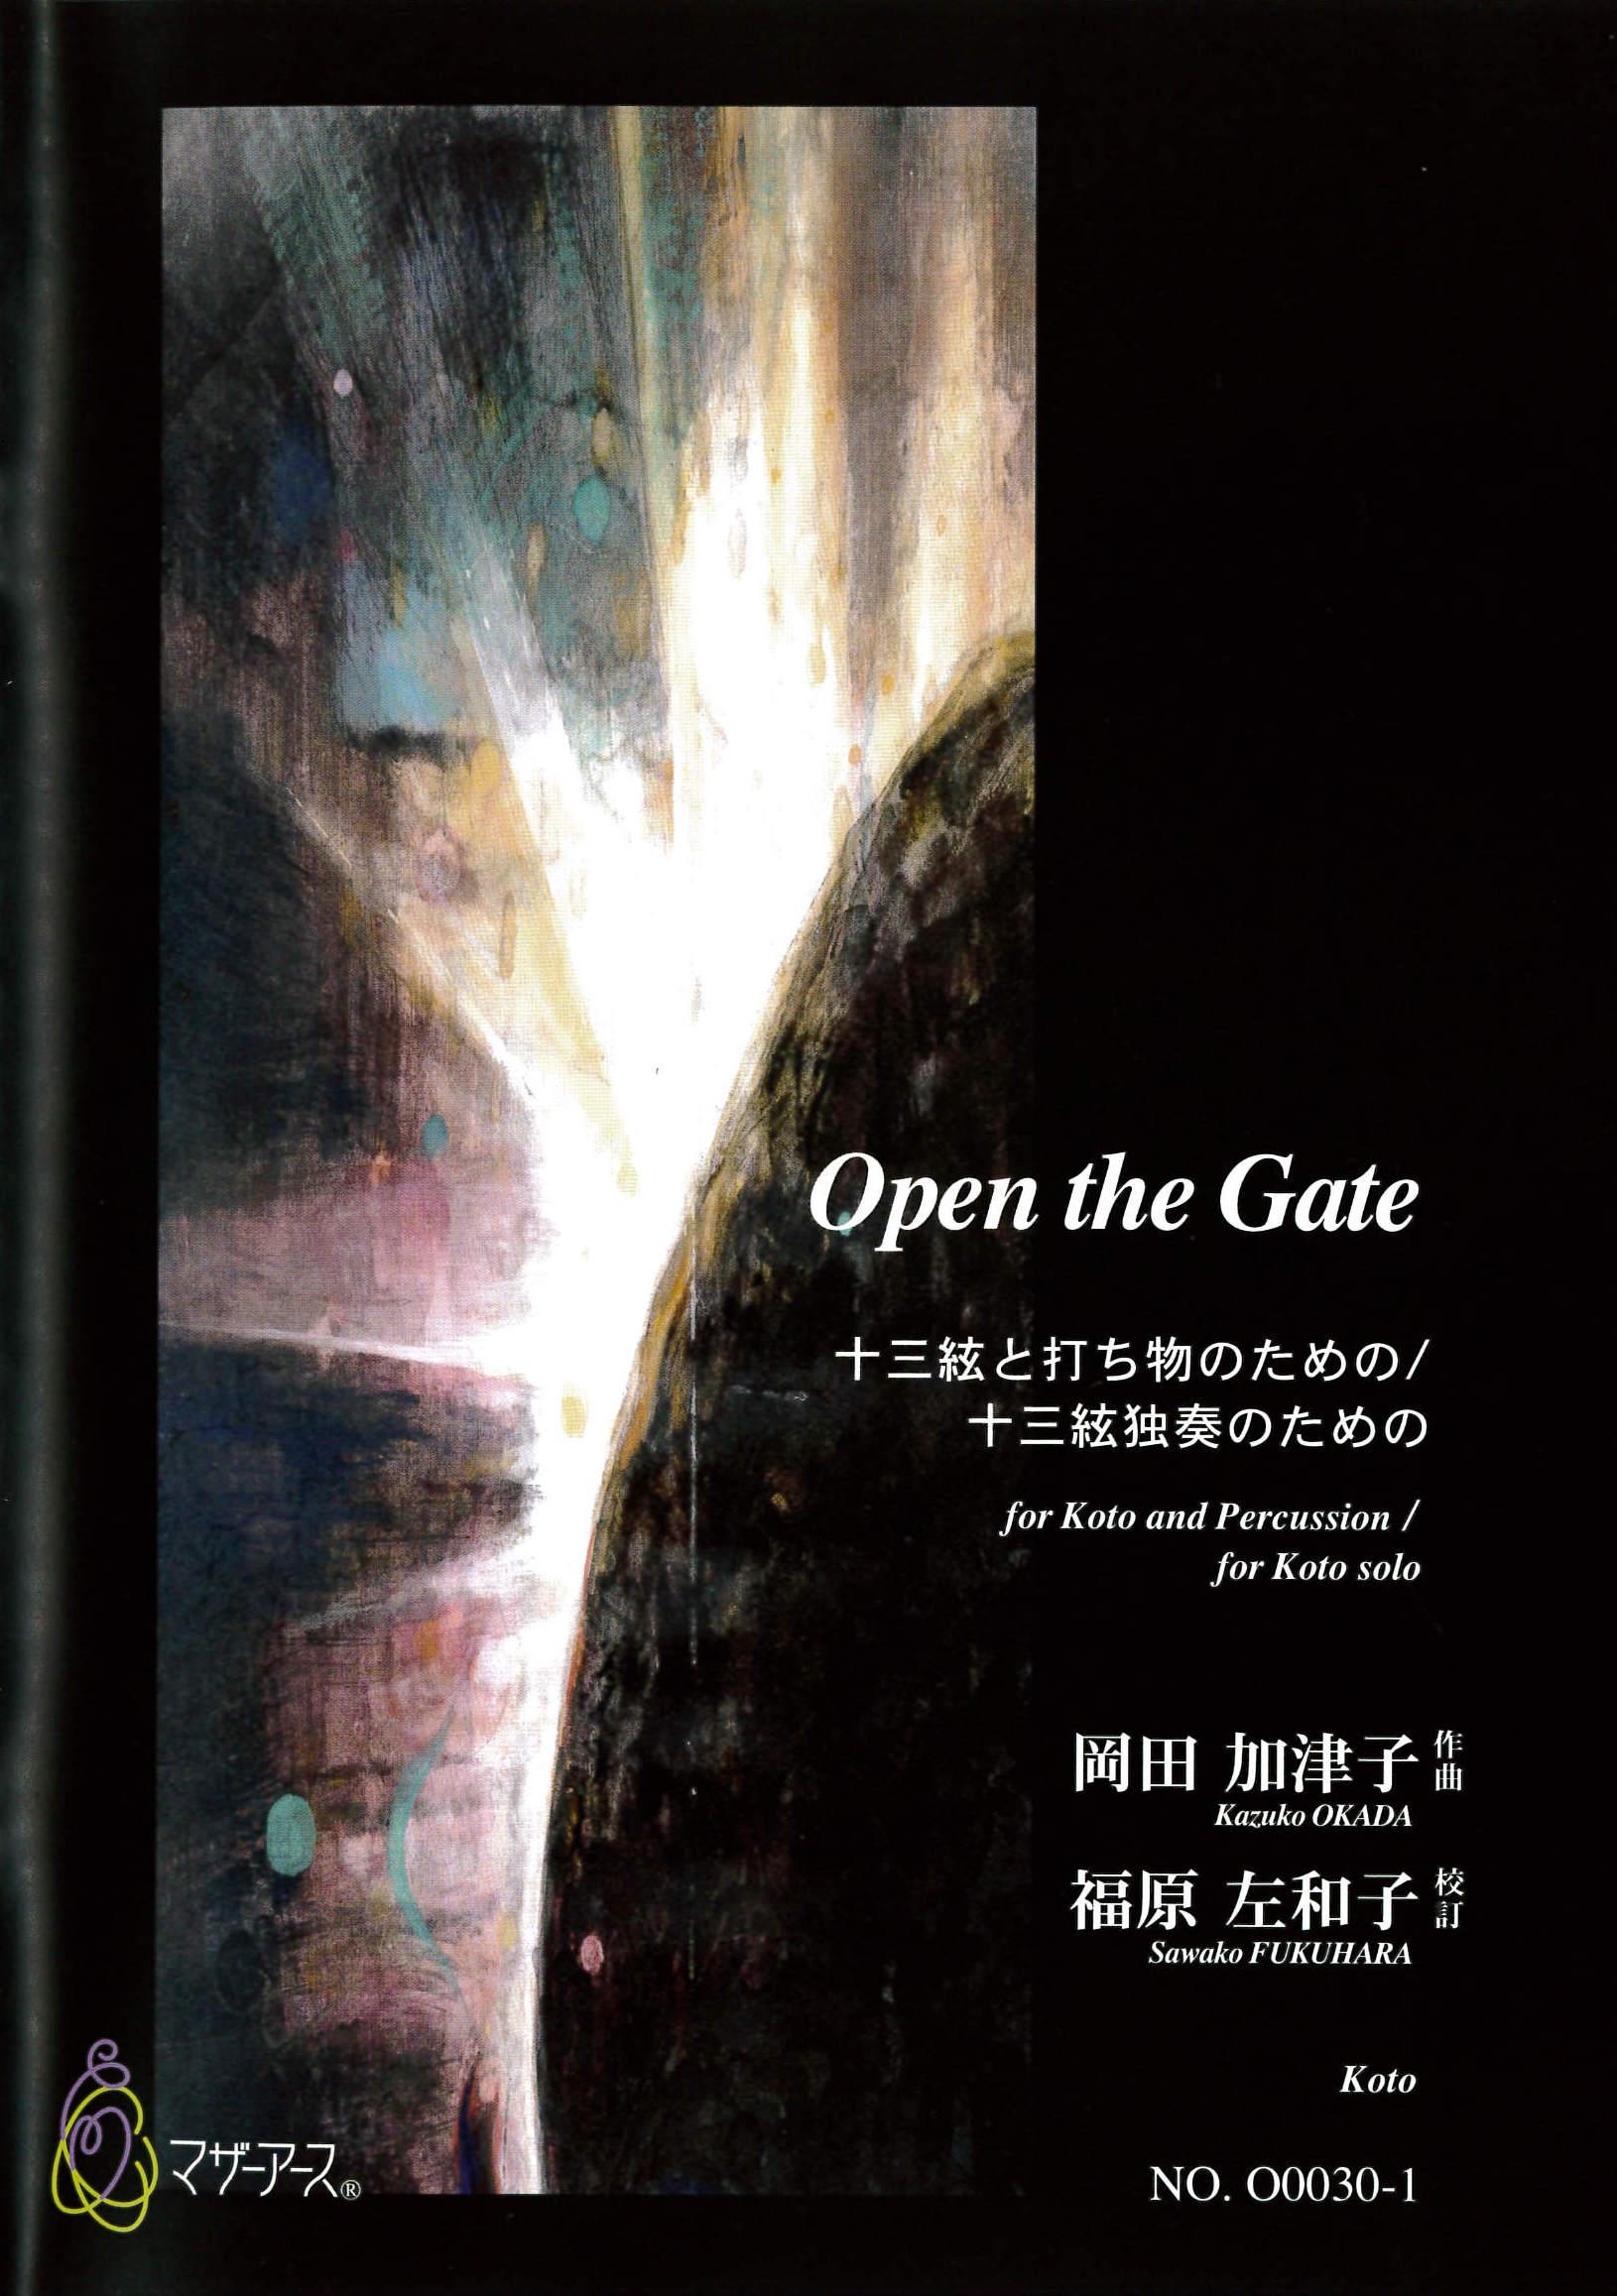 箏譜+五線譜 Open the Gate[5662]